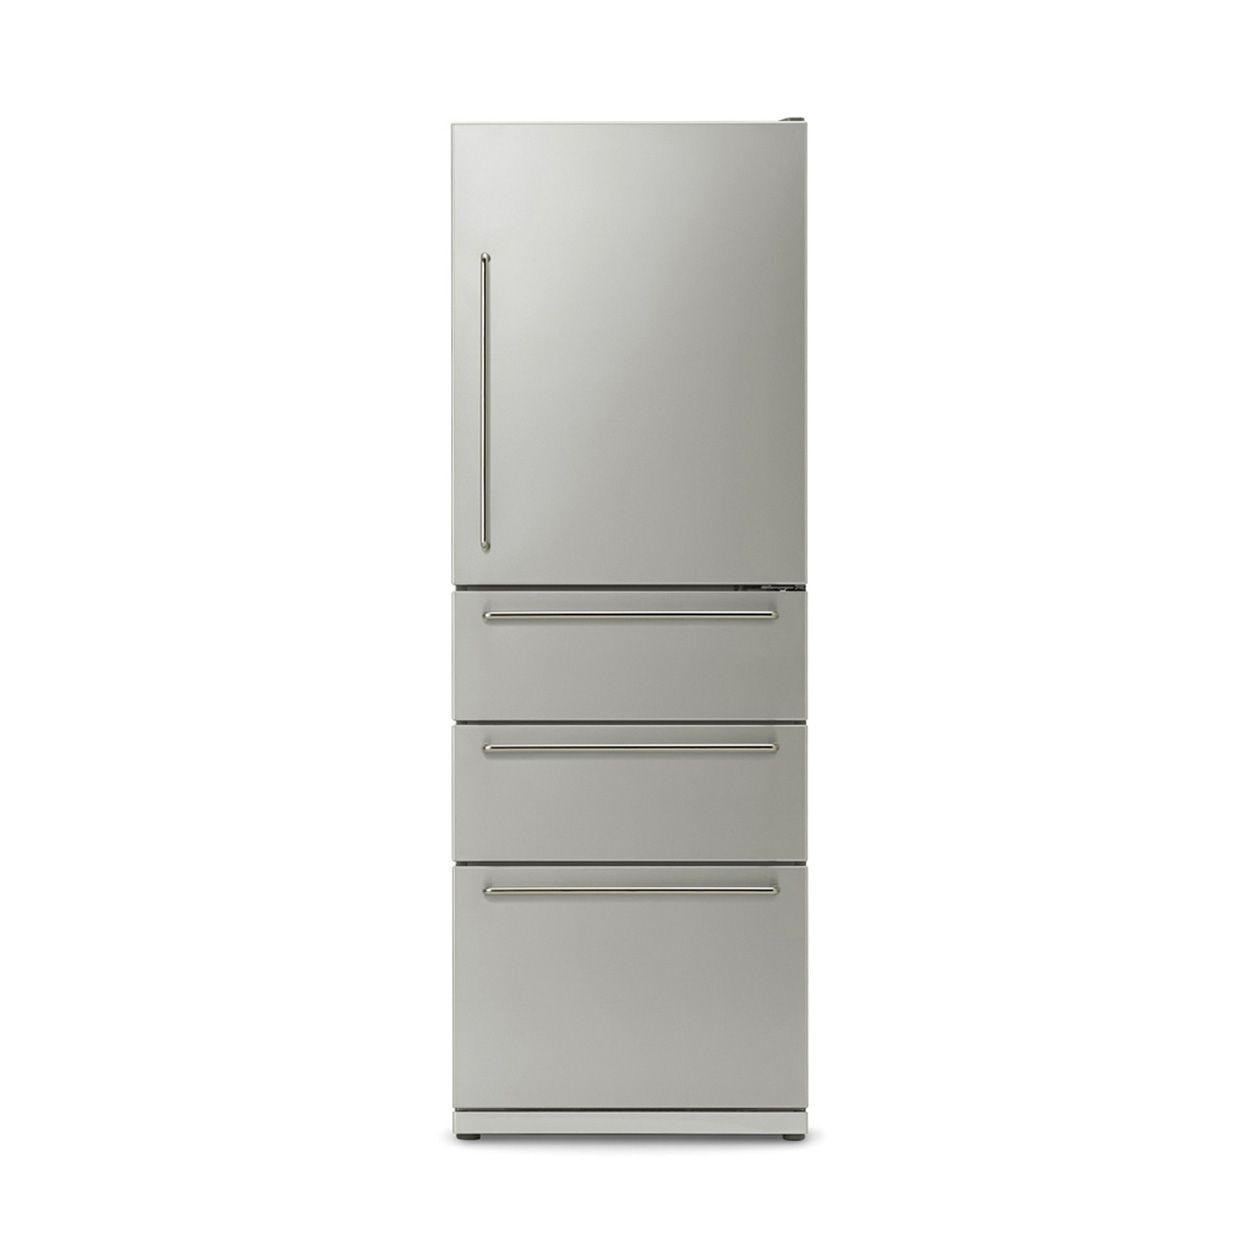 RoomClip商品情報 - 電気冷蔵庫・355L・ステンレス